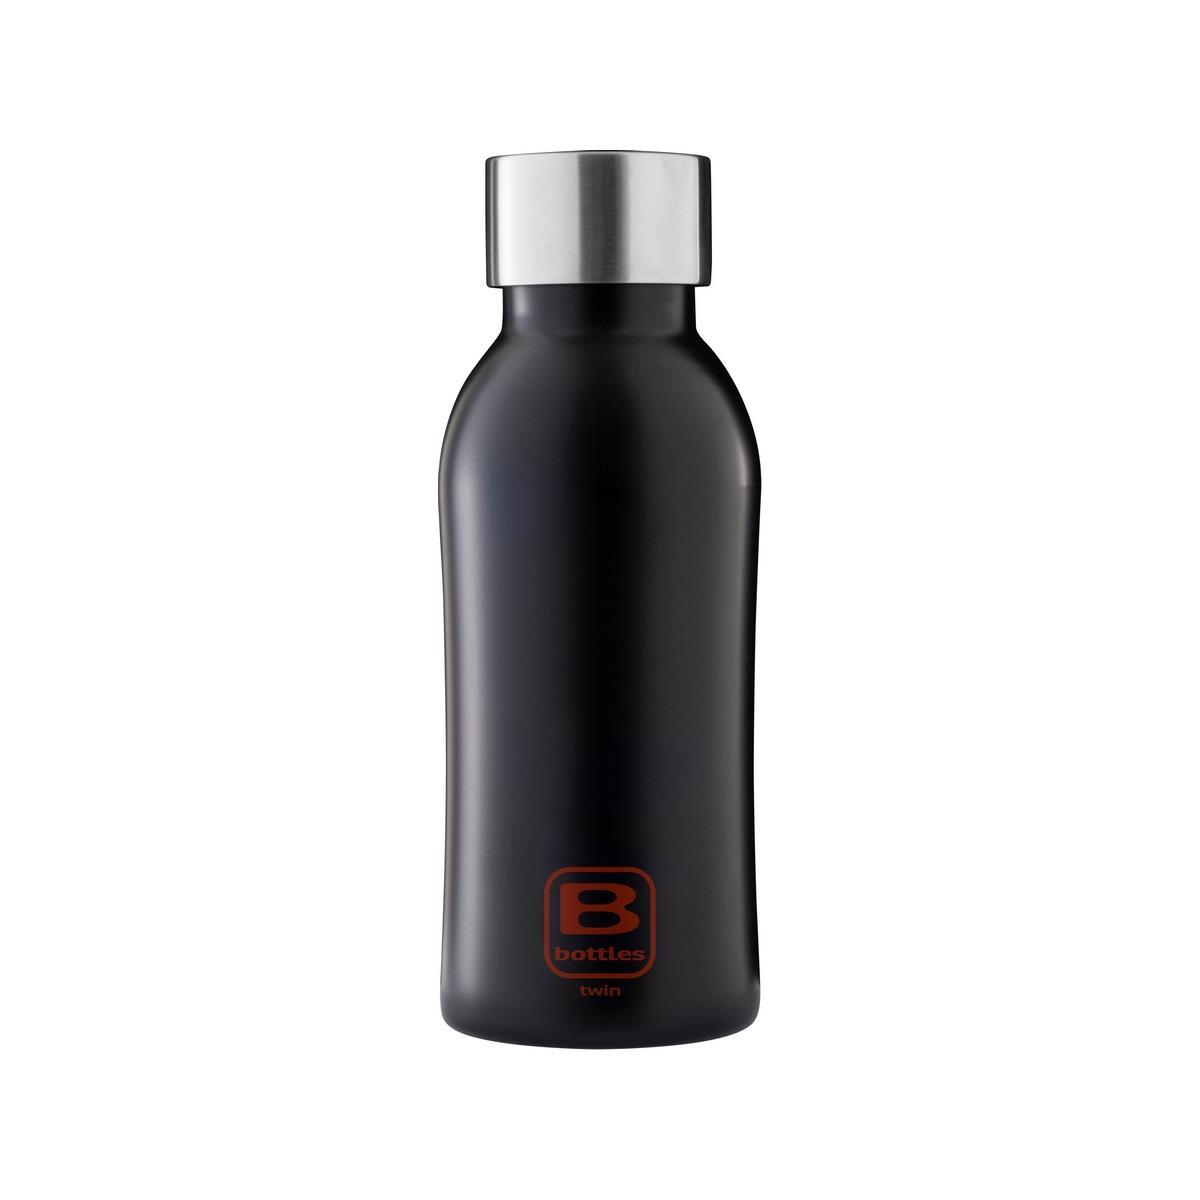 B Bottles Twin - Nero Opaco - 350 ml - Bottiglia Termica a doppia parete in acciaio inox 18/10